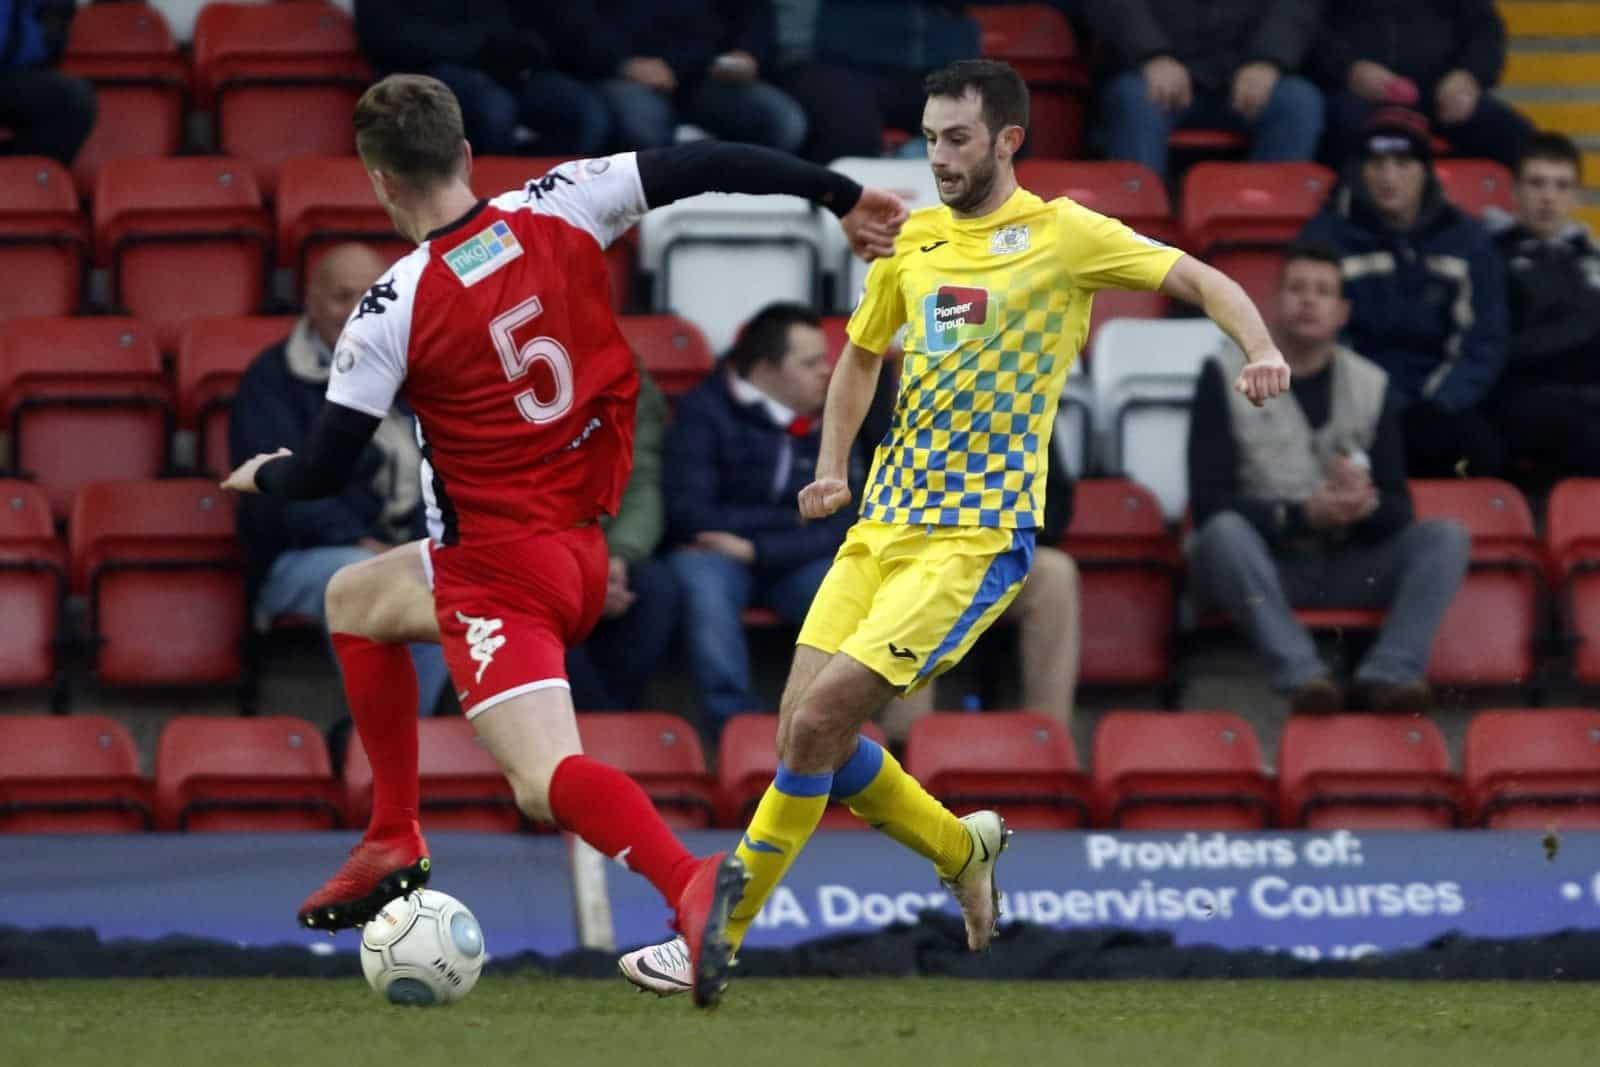 Adam Thomas, Stockport County FC